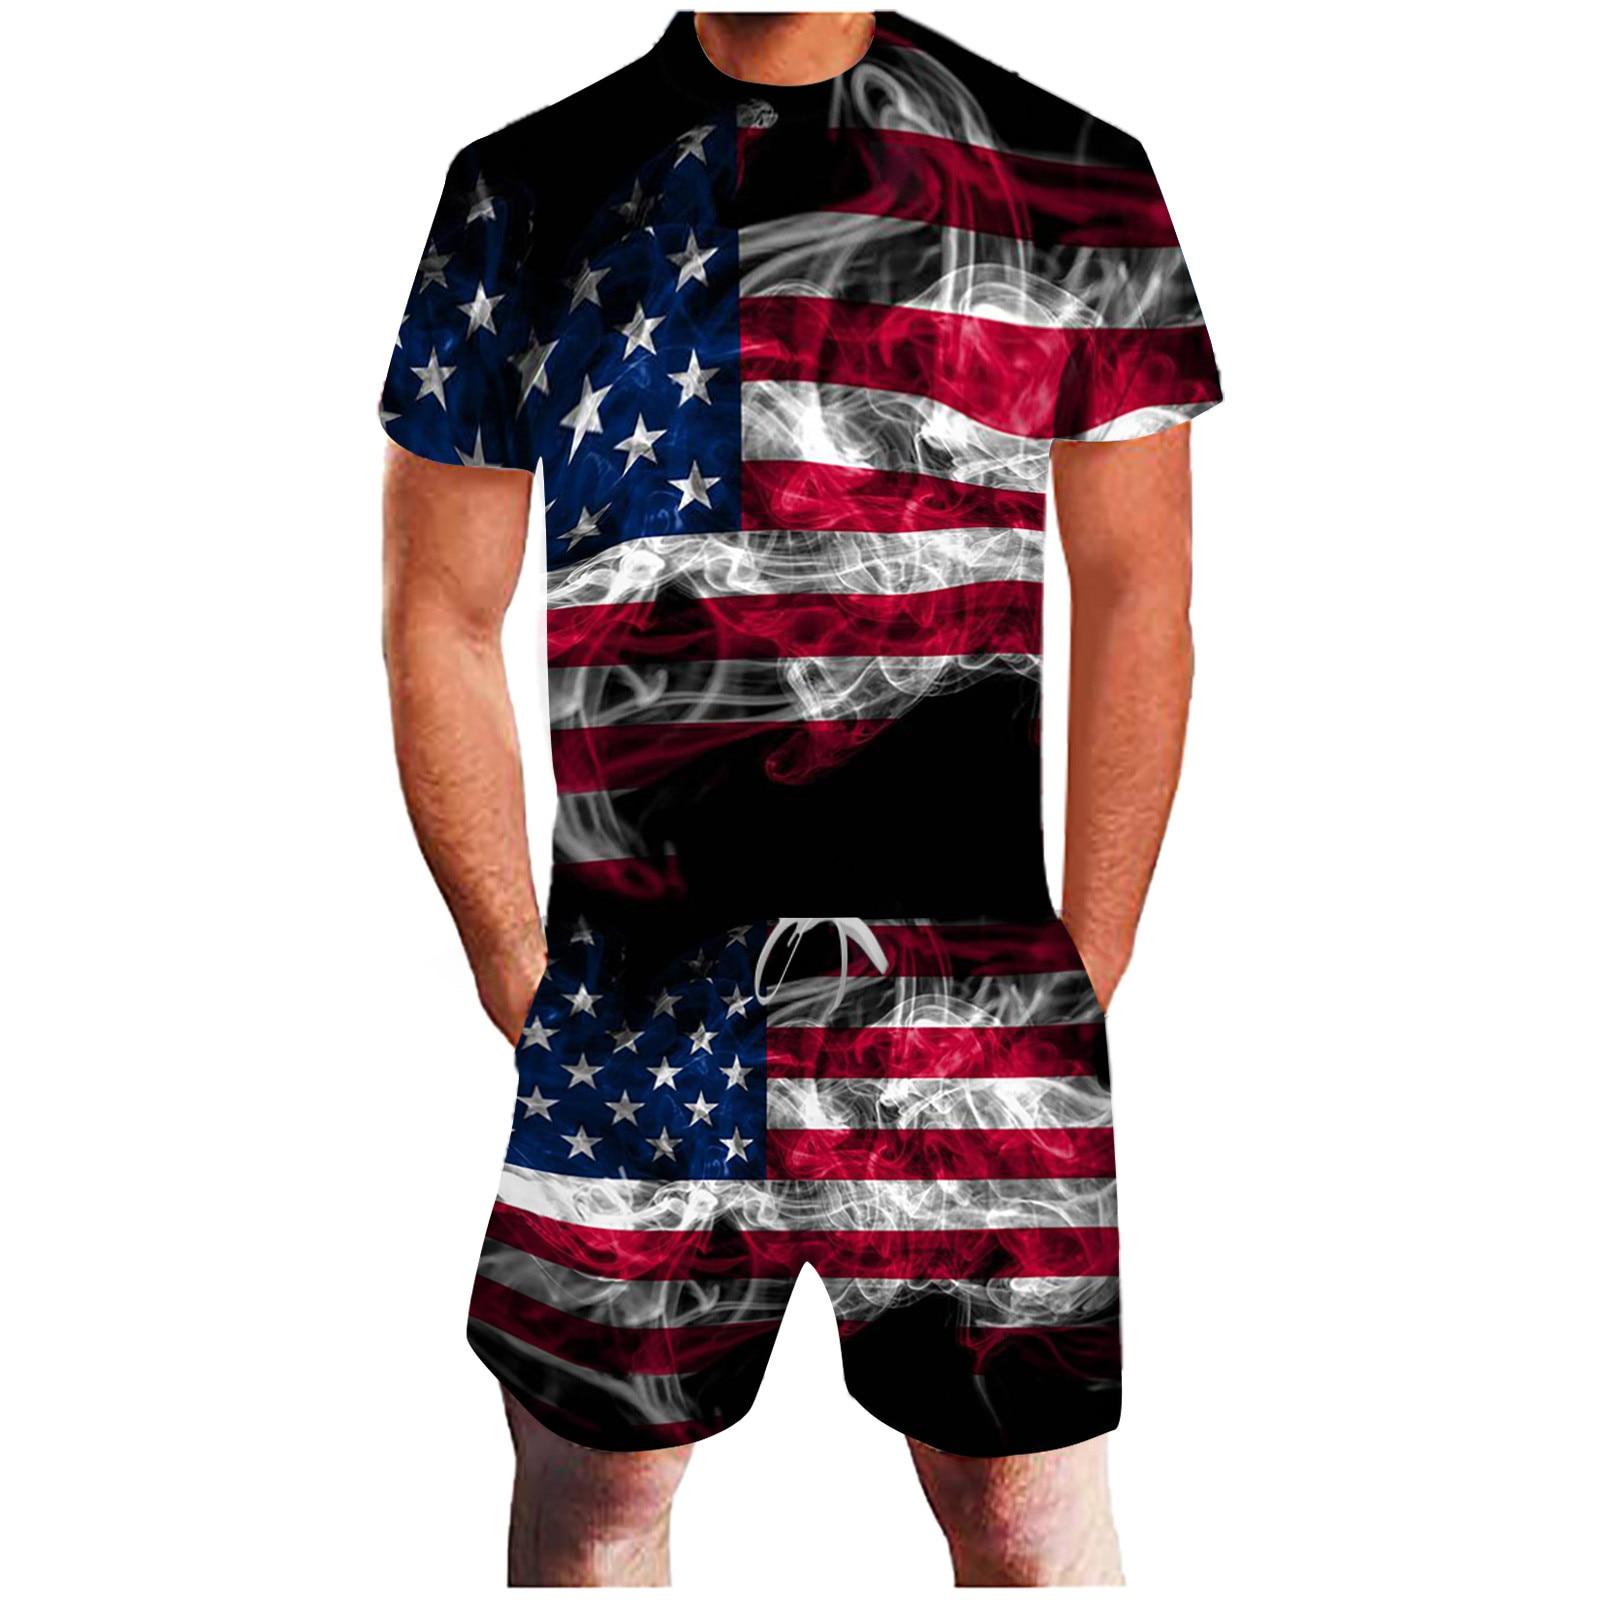 2021 New Brand Summer Men s American Flag Print Short Sleeve T shirt Set 2pieces Men